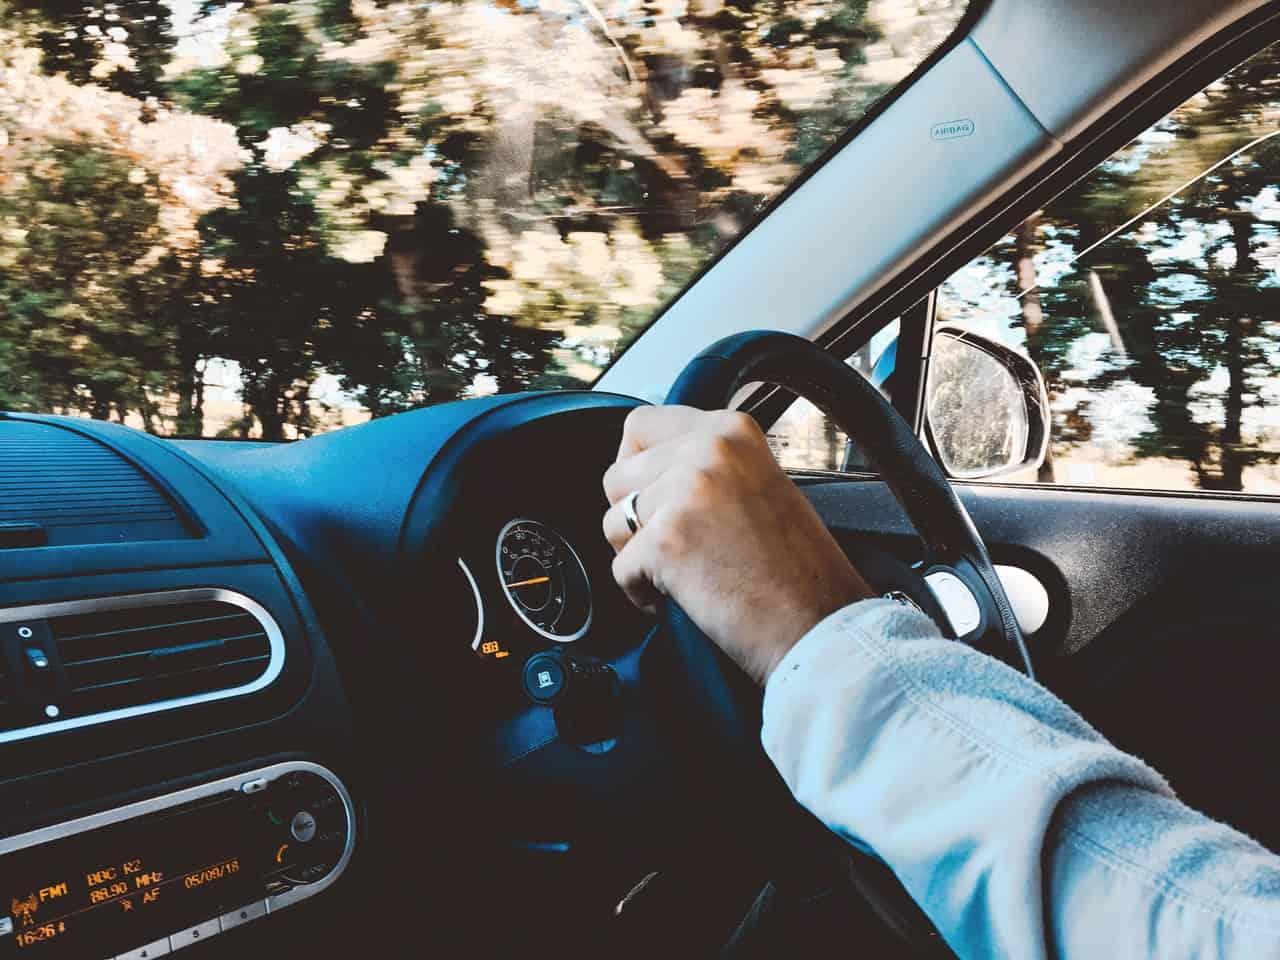 Mand i bil